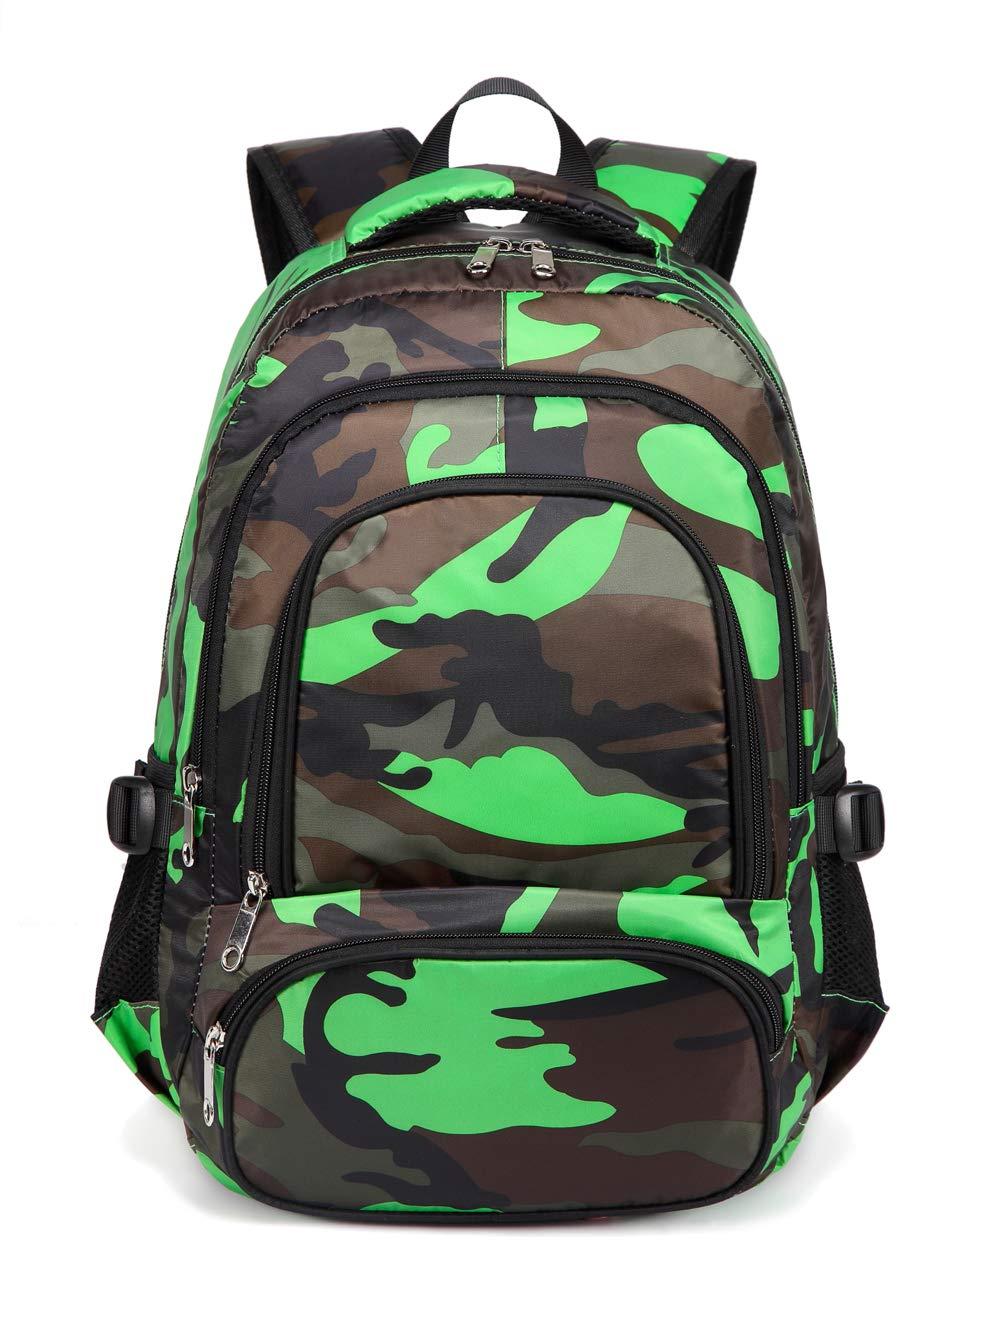 Camo Orange Kids Backpacks for Boys Camouflage Elementary School Bags Bookbags Lightweight Durable